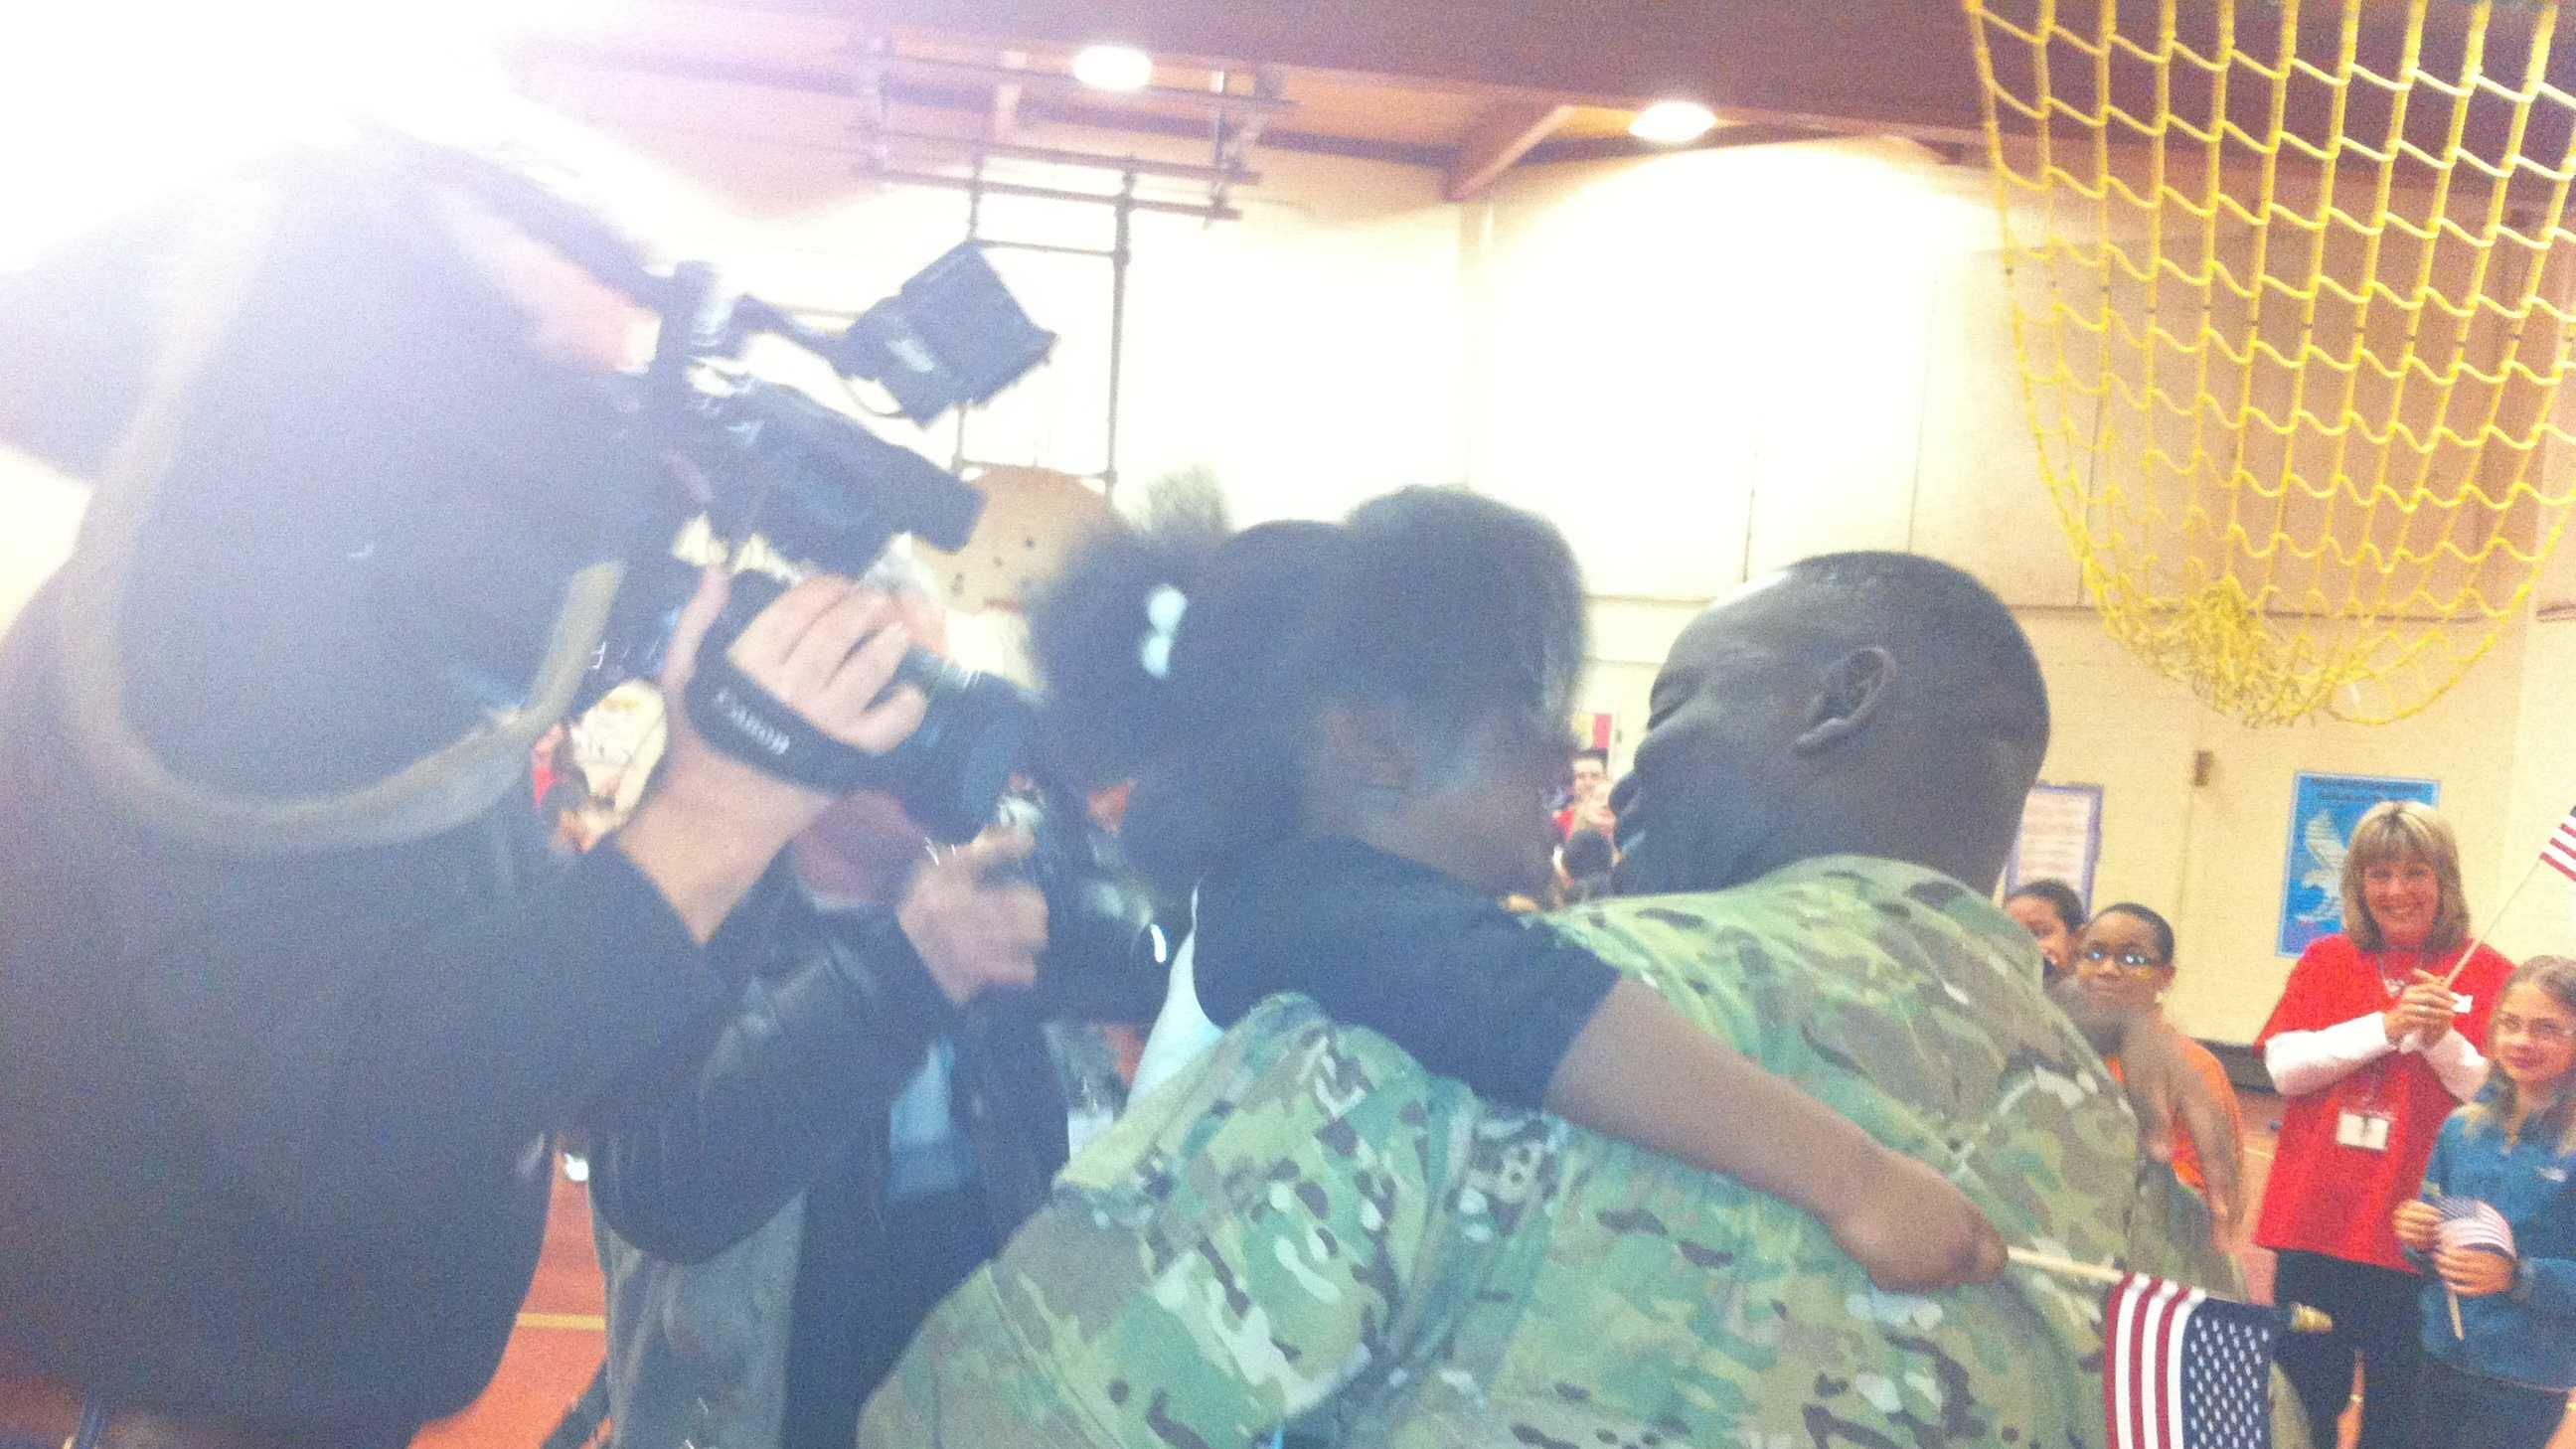 Soldier greets kids